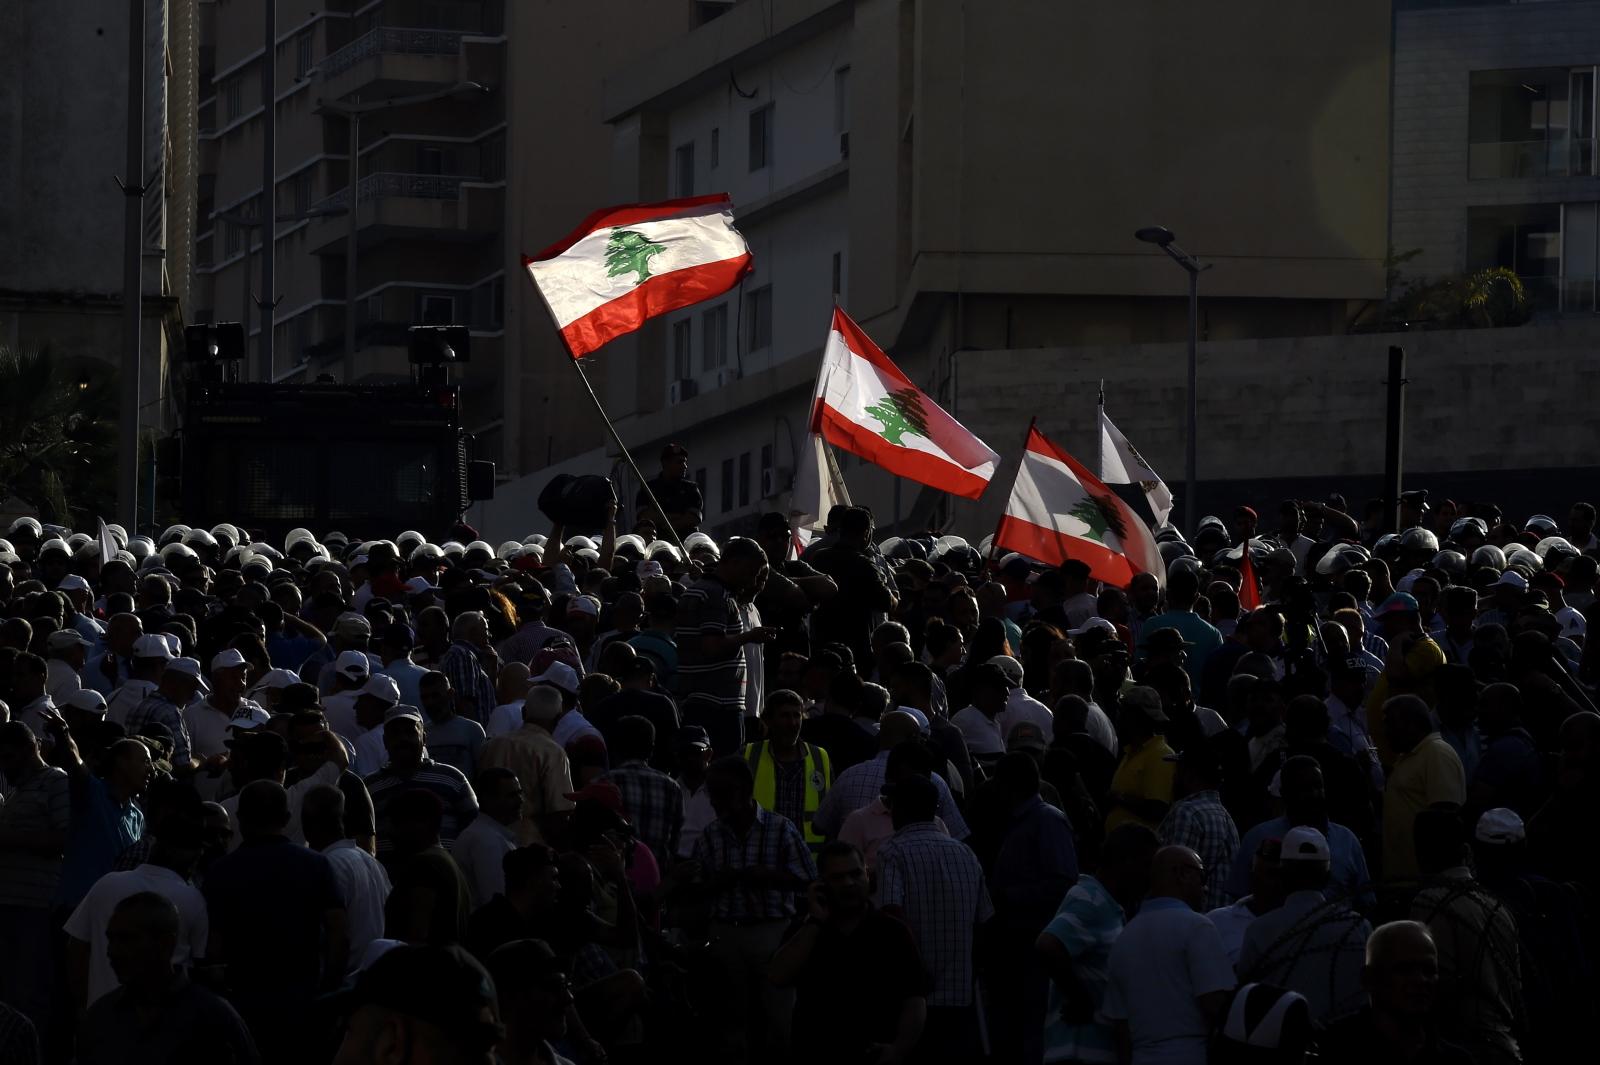 Protesty w Libanie. Fot. PAP/EPA/WAEL HAMZEH